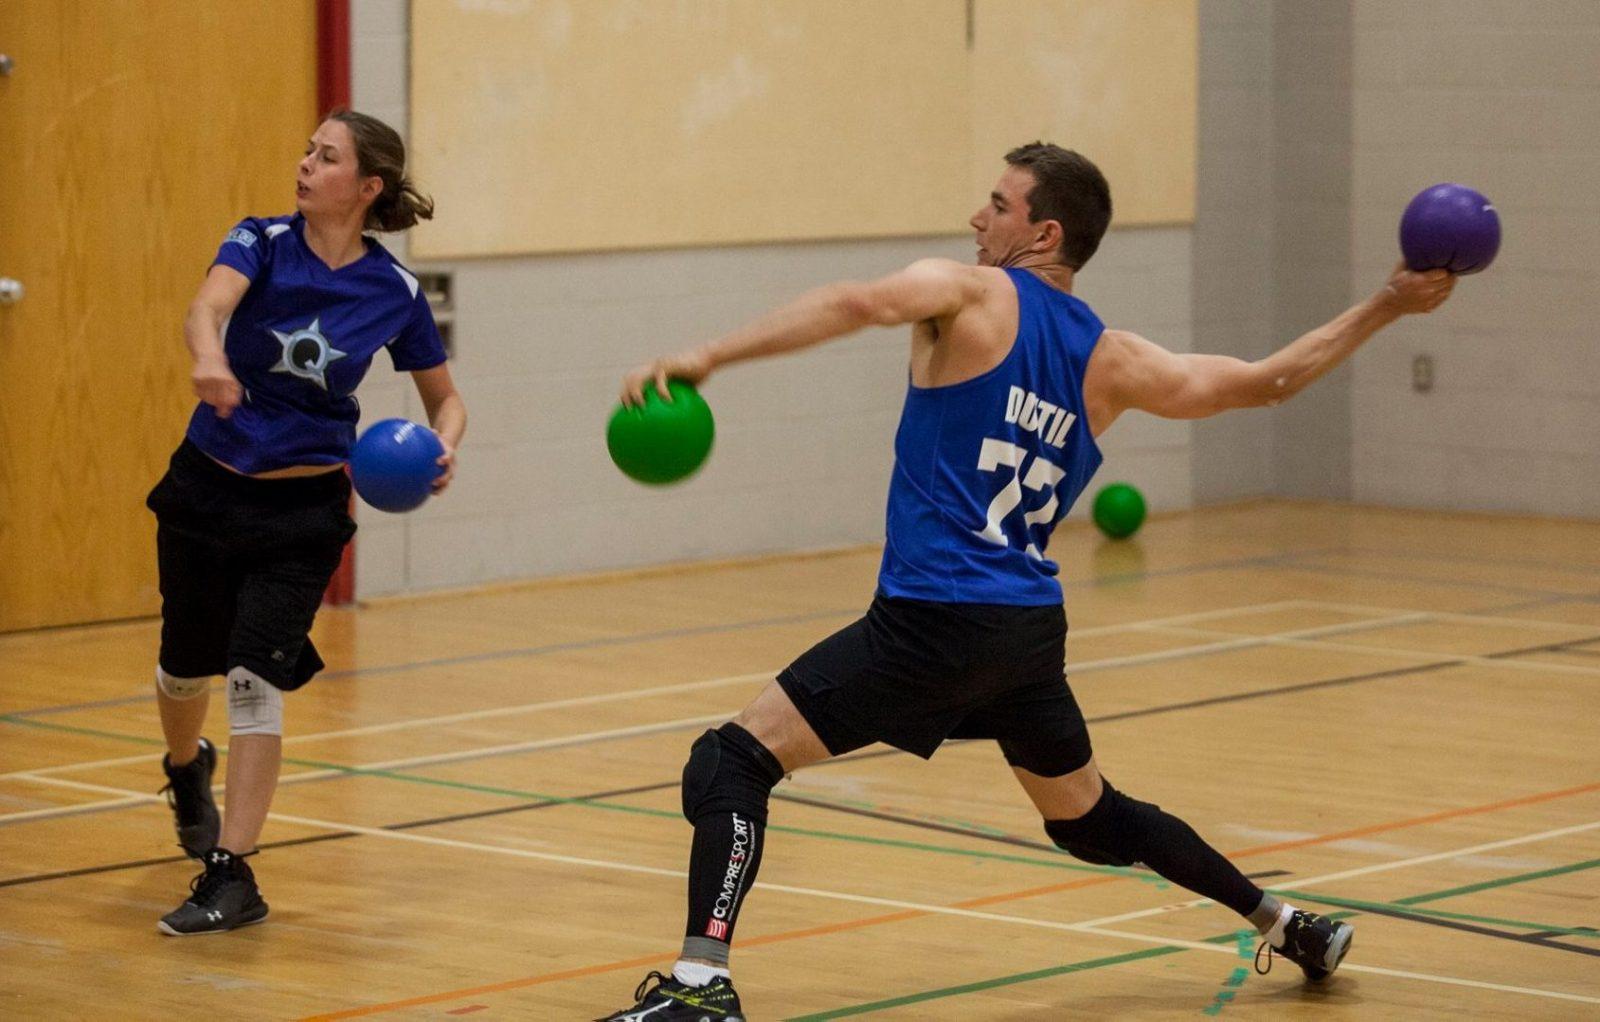 La fièvre du dodgeball gagne Drummondville